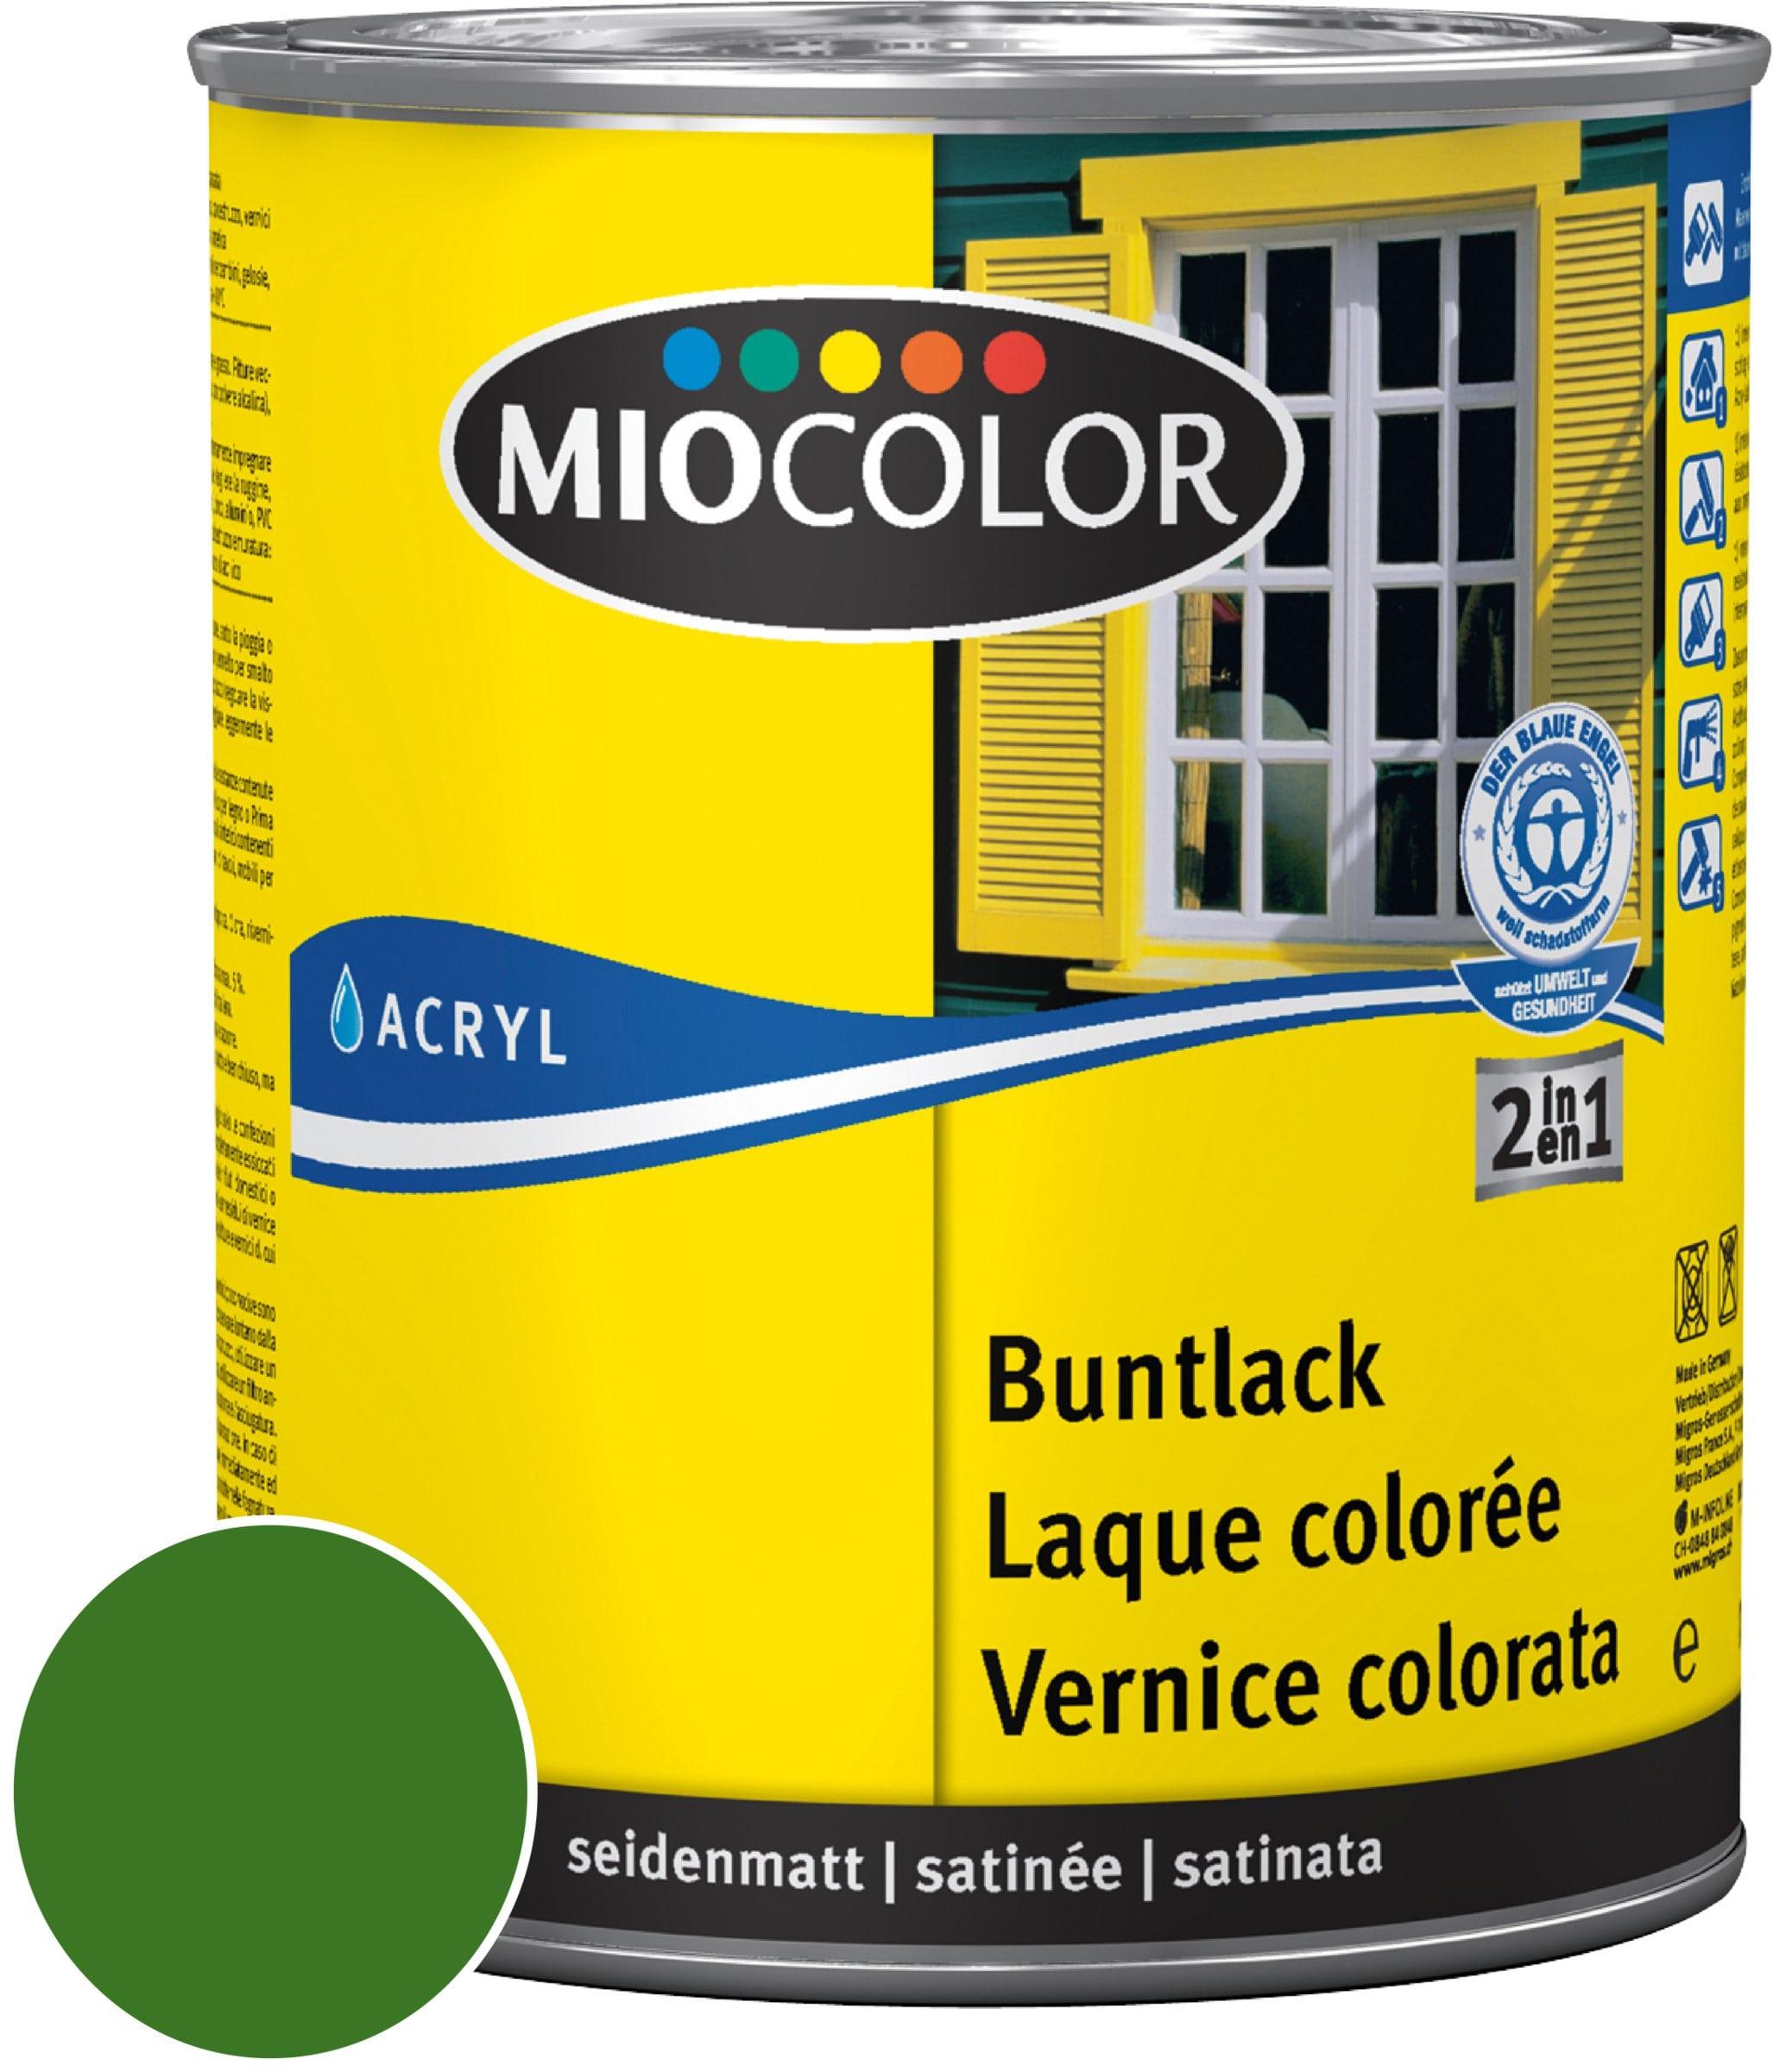 acryl buntlack seidenmatt migipedia. Black Bedroom Furniture Sets. Home Design Ideas